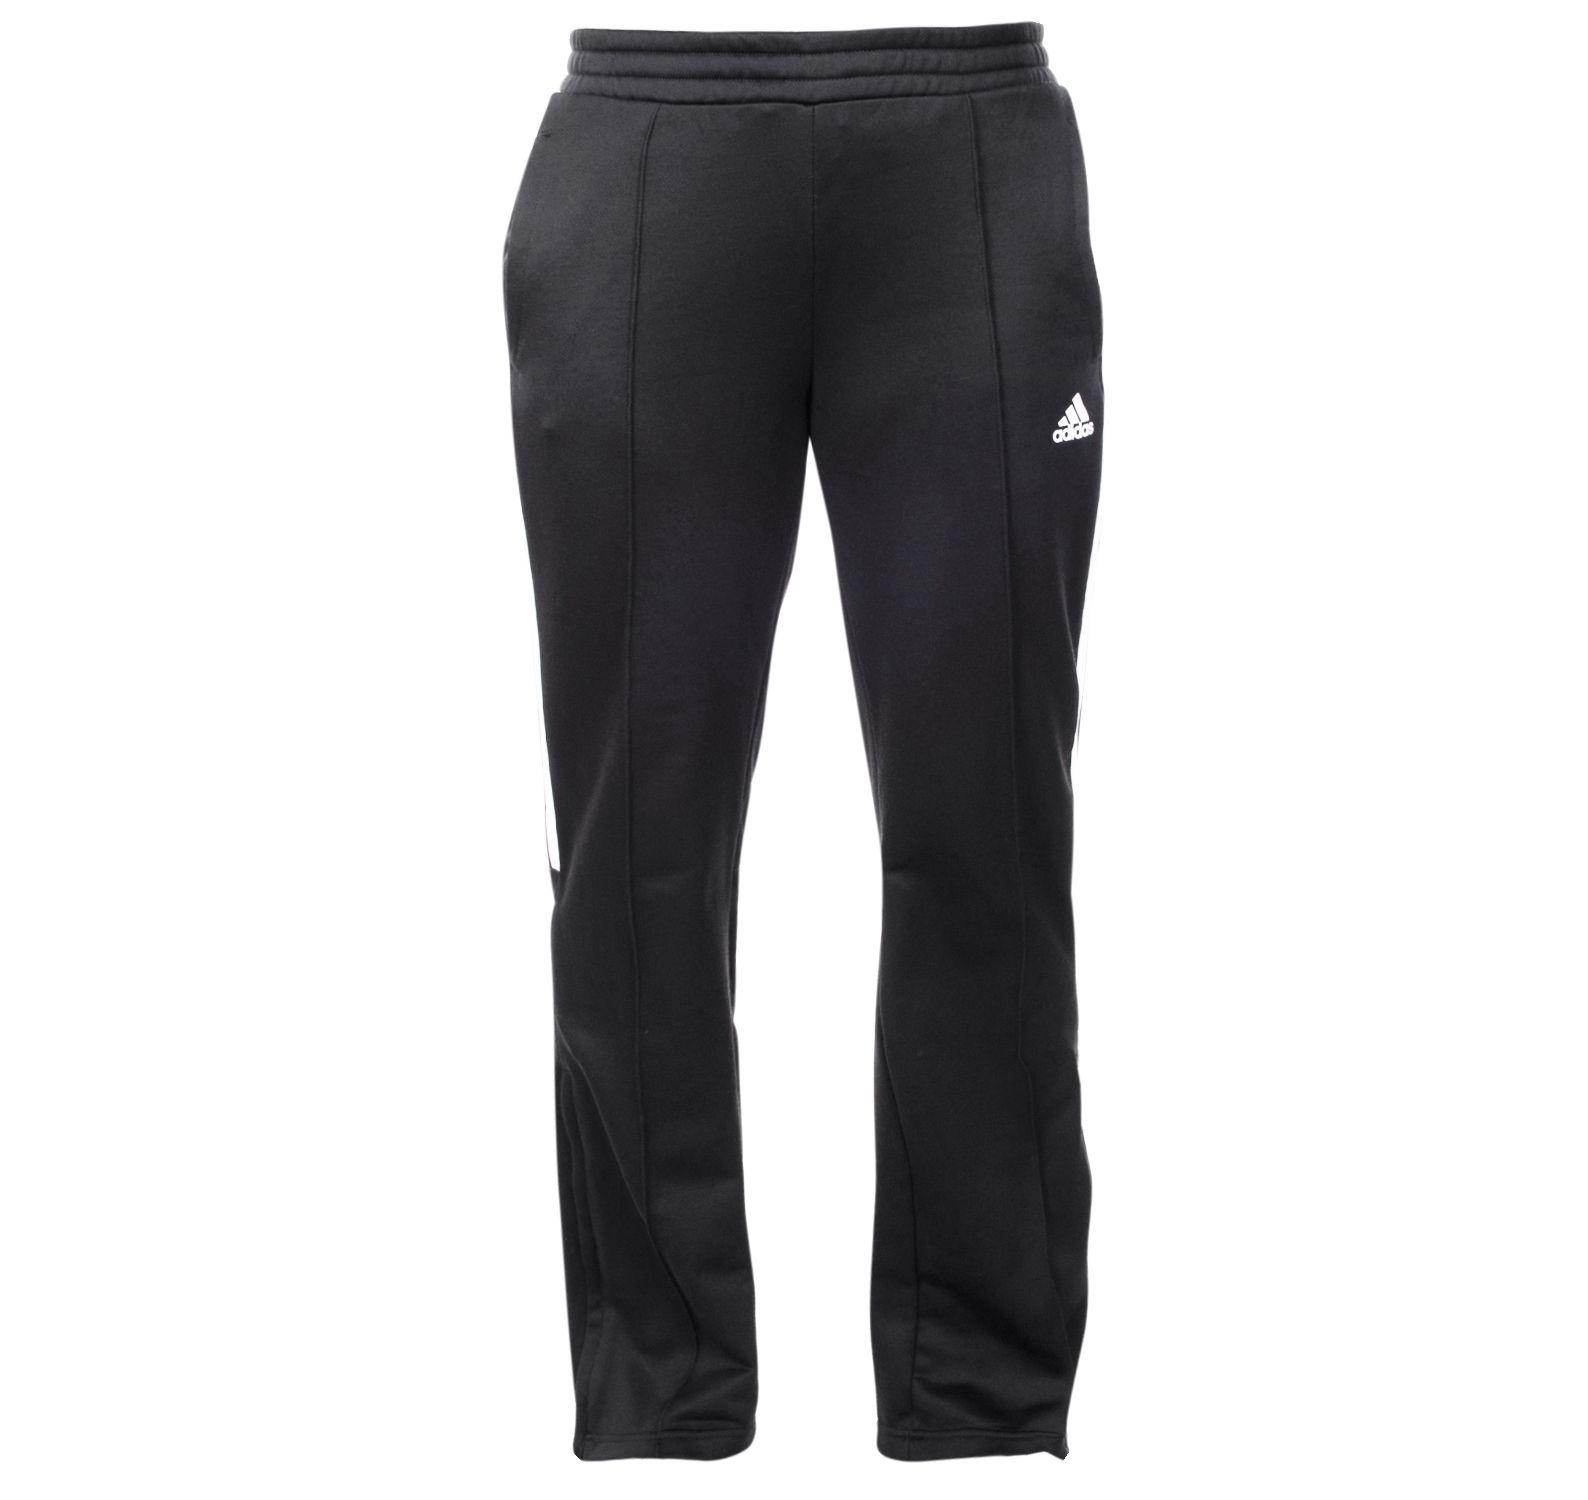 W New A Wide Pt, Black, L,  Adidas Kläder